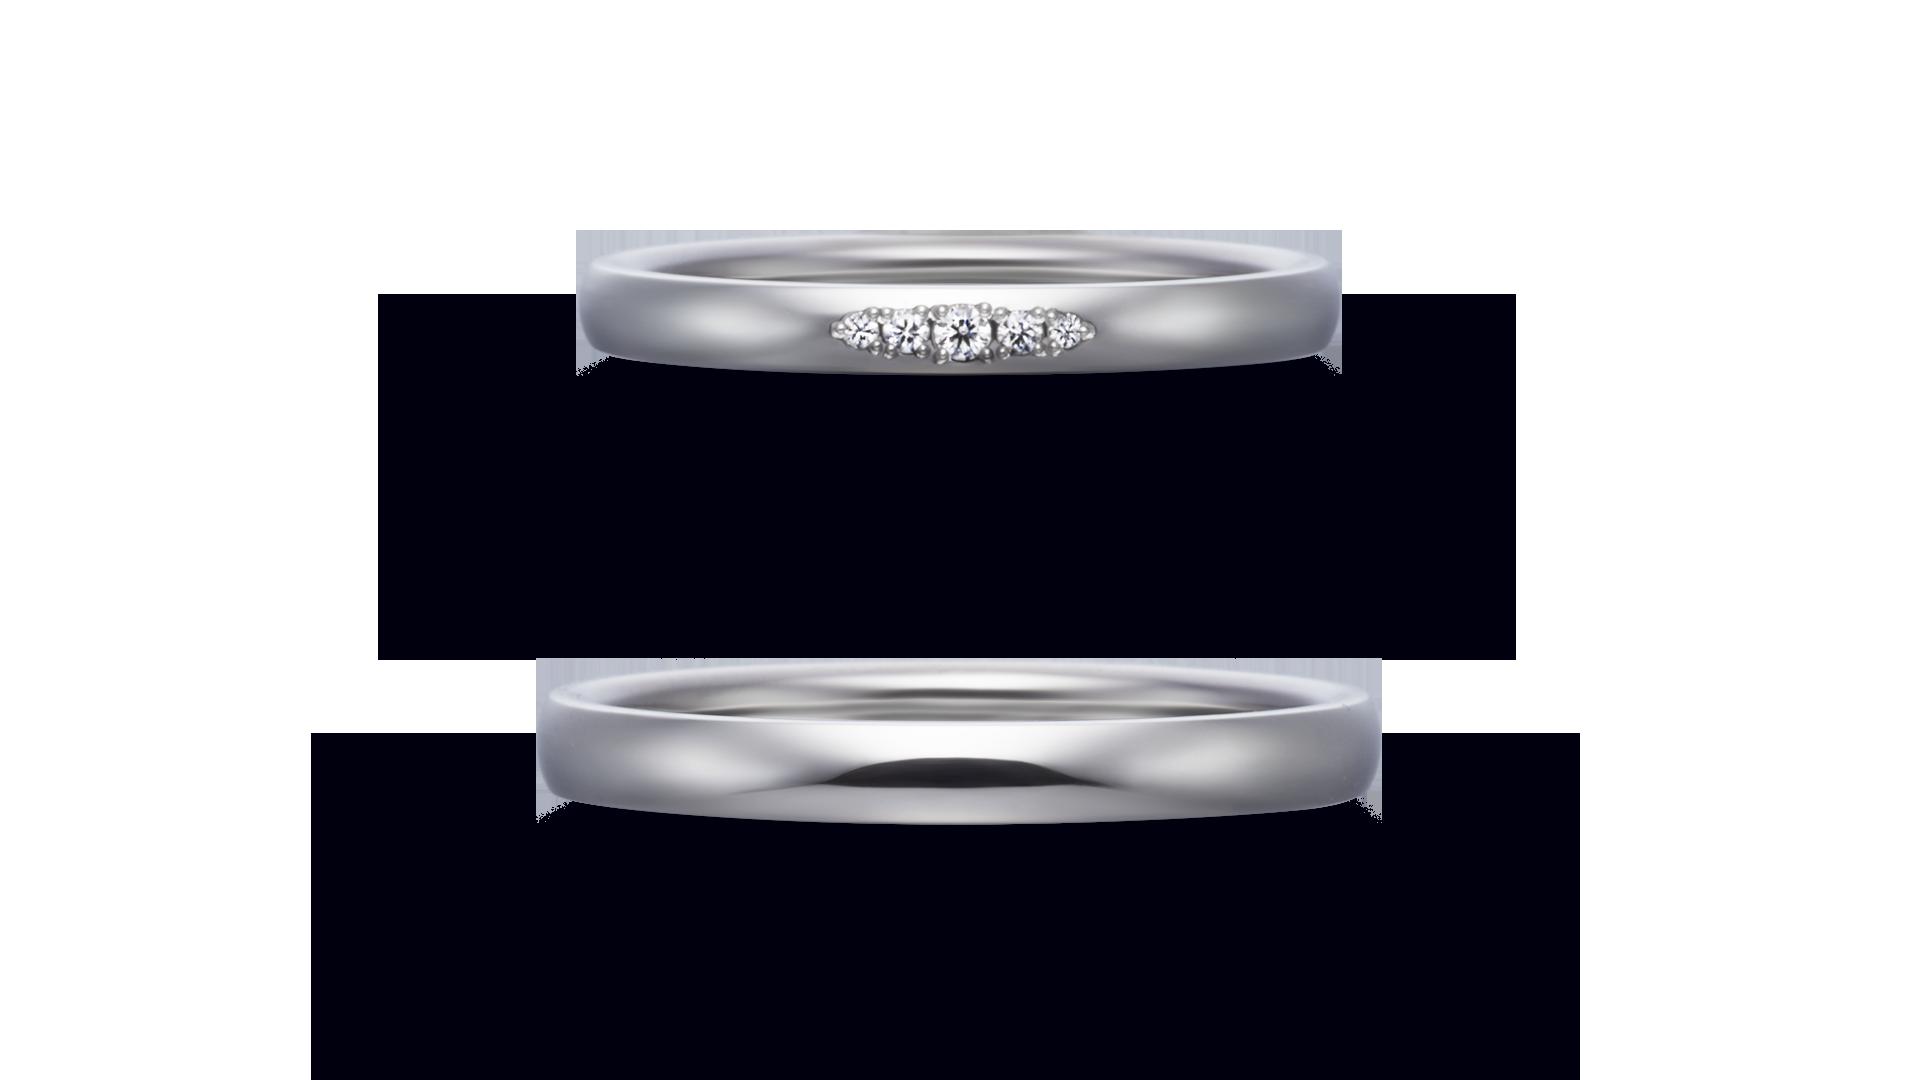 【NEW】TitaniumJuno ≪低アレルギー≫チタンユノー(9月14日発売) | 結婚指輪サムネイル 1